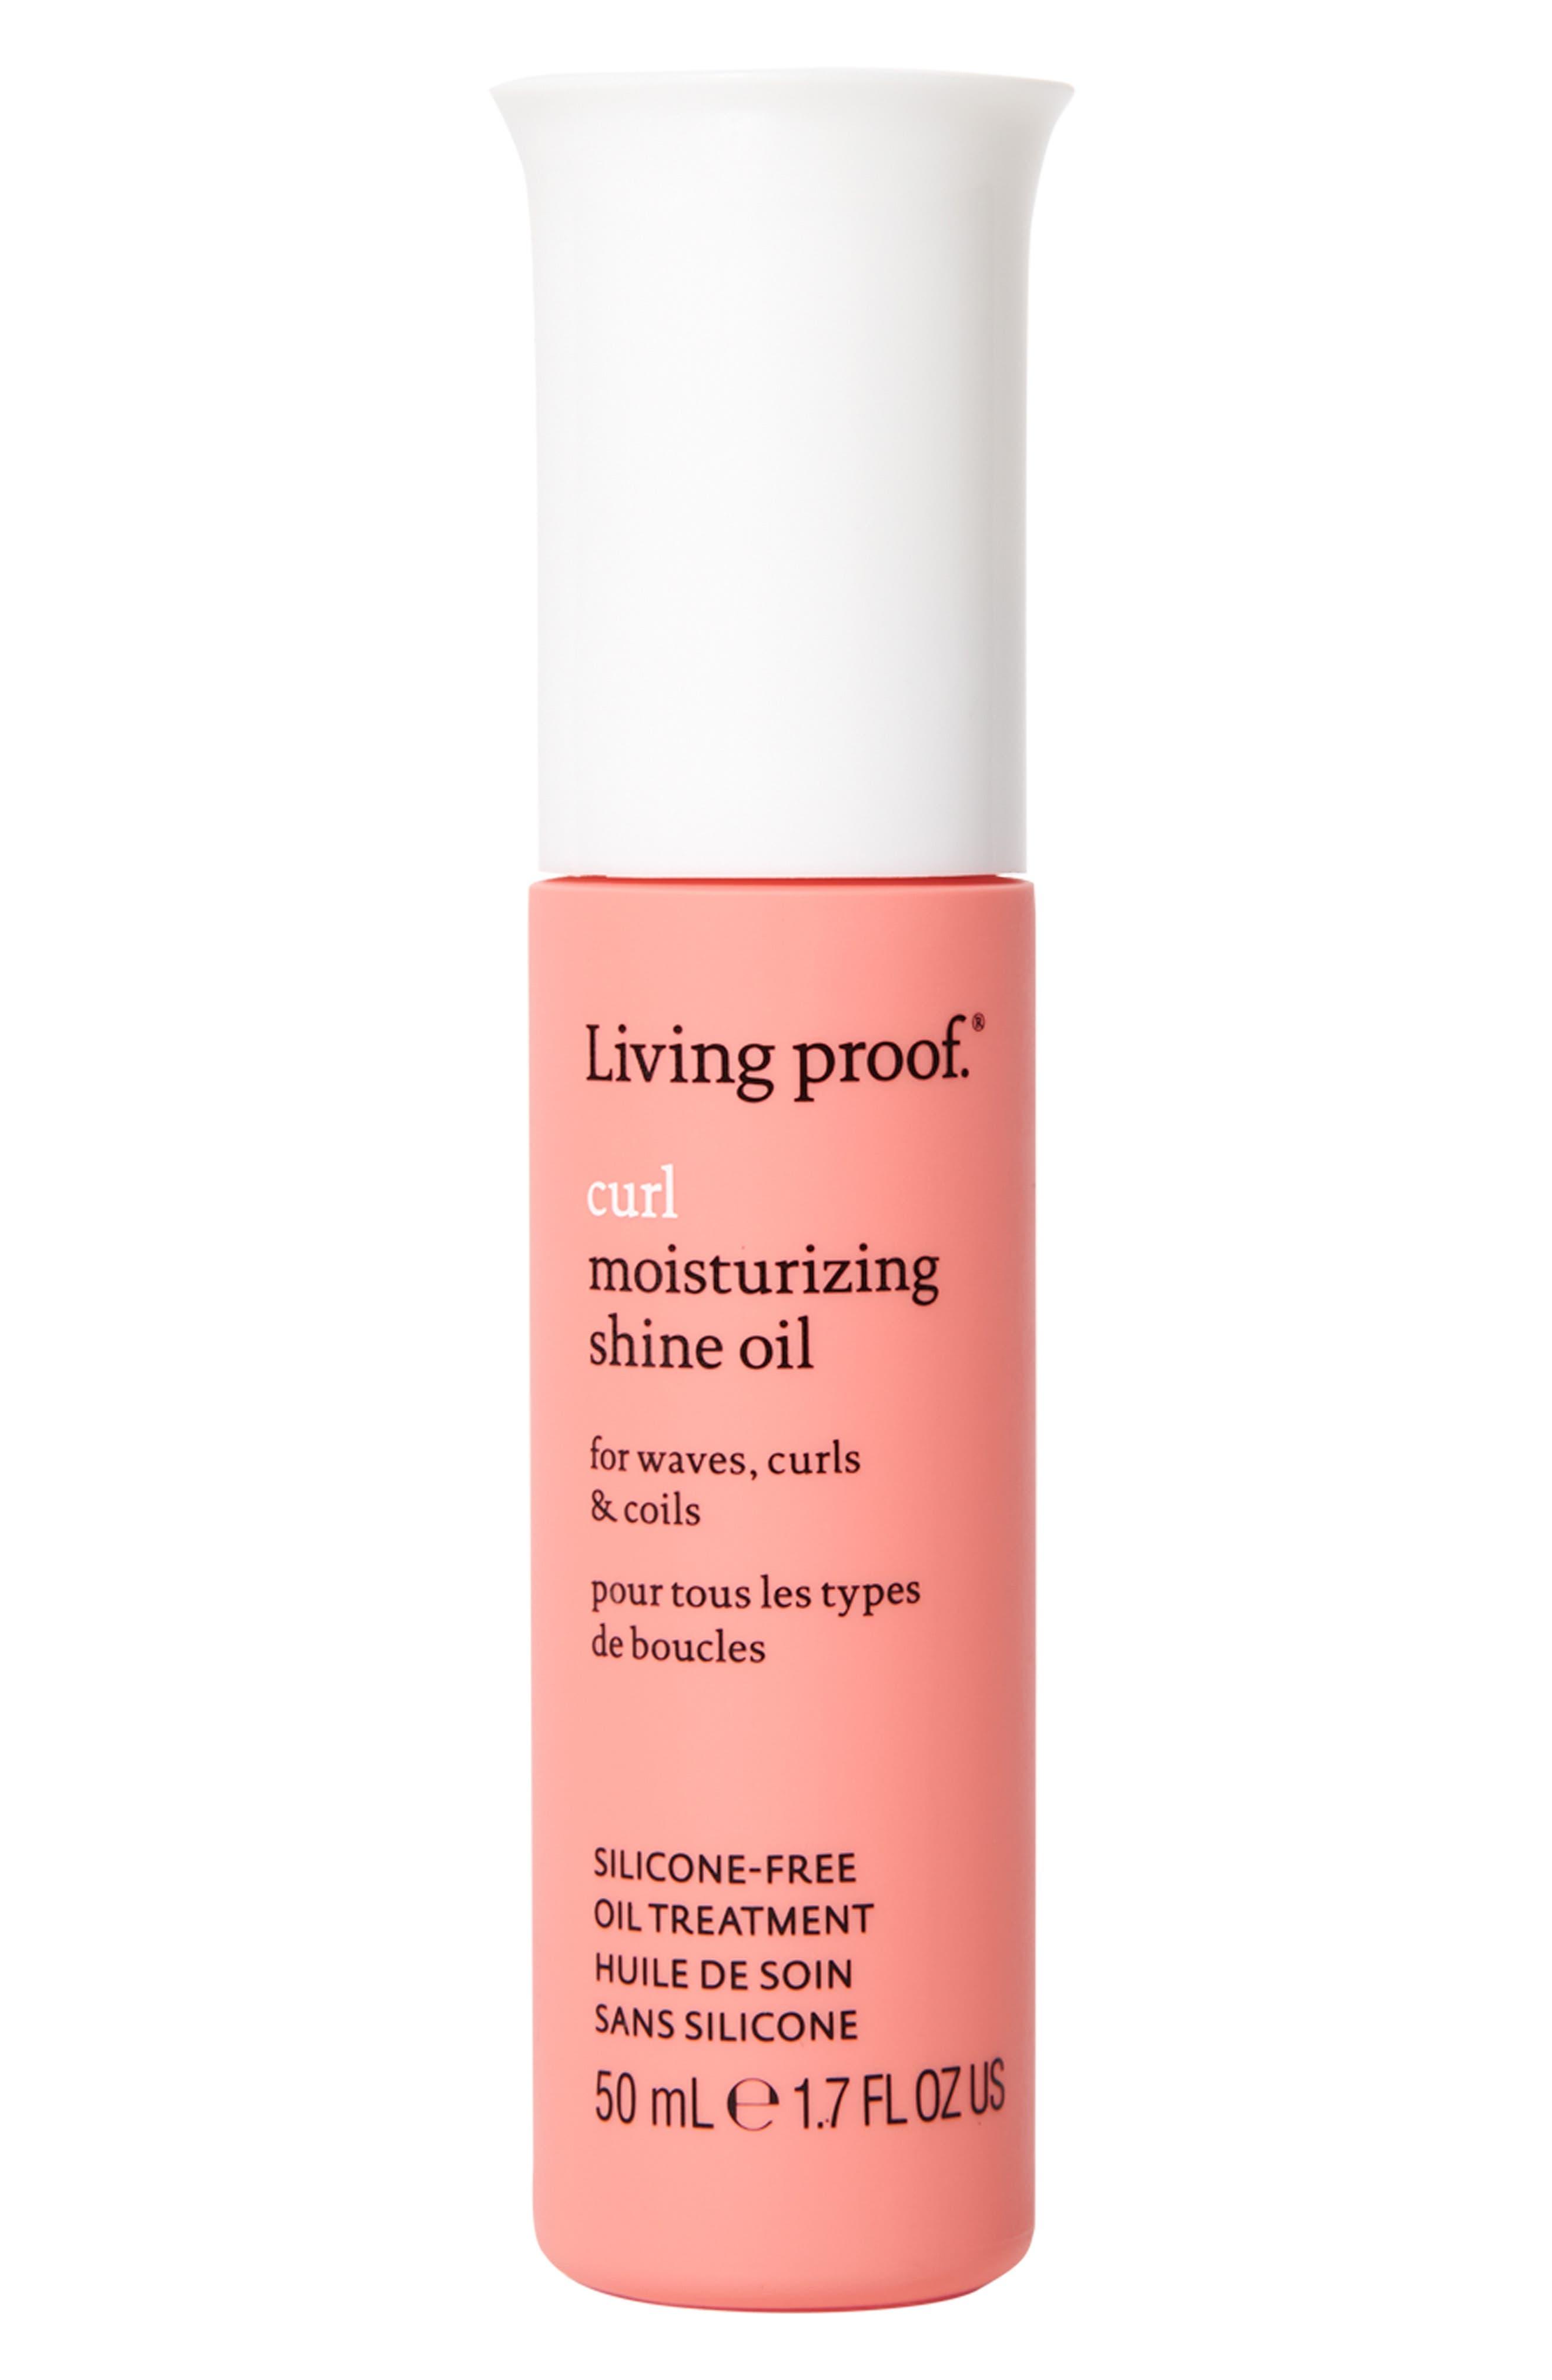 Living Proof Curl Moisturizing Shine Oil